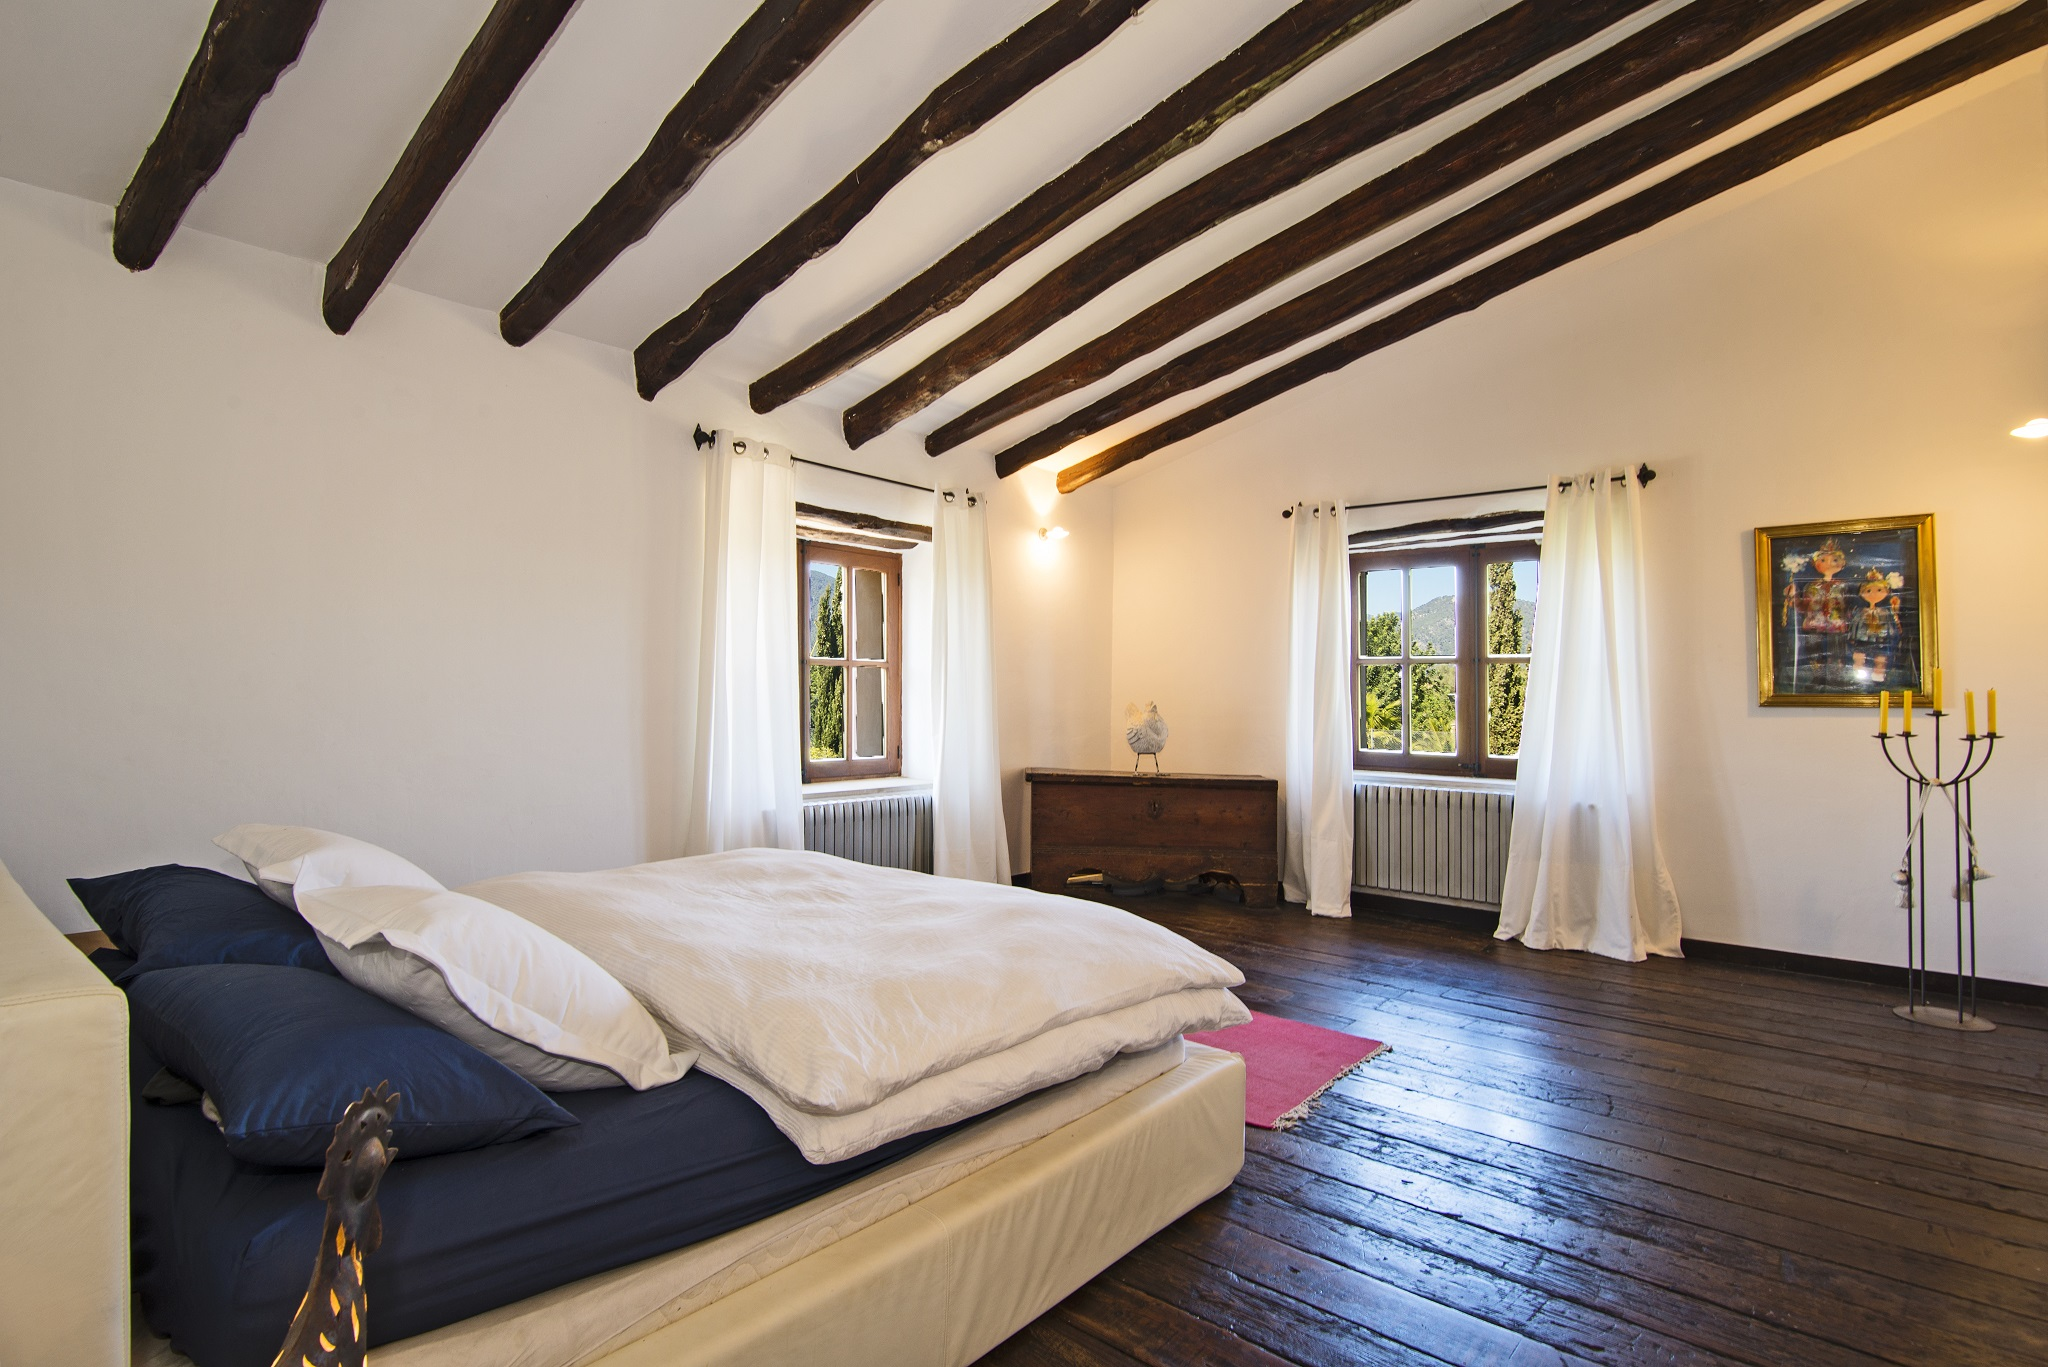 Finca Santa Maria Double room